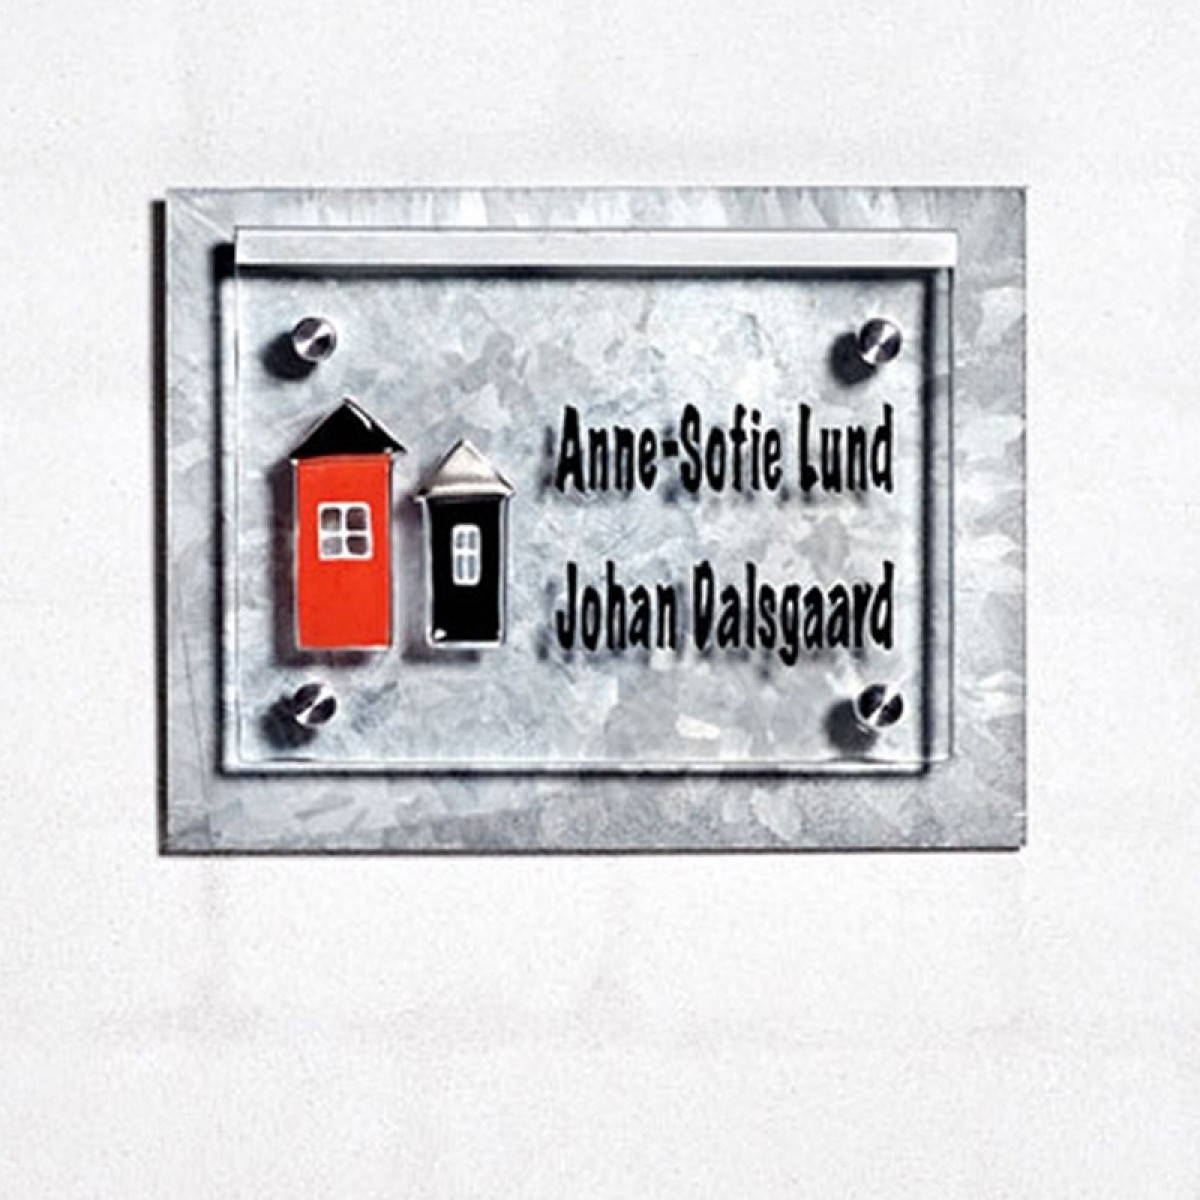 NAVNESKILT 2 HUSE GALVANISERET LED LYS-01